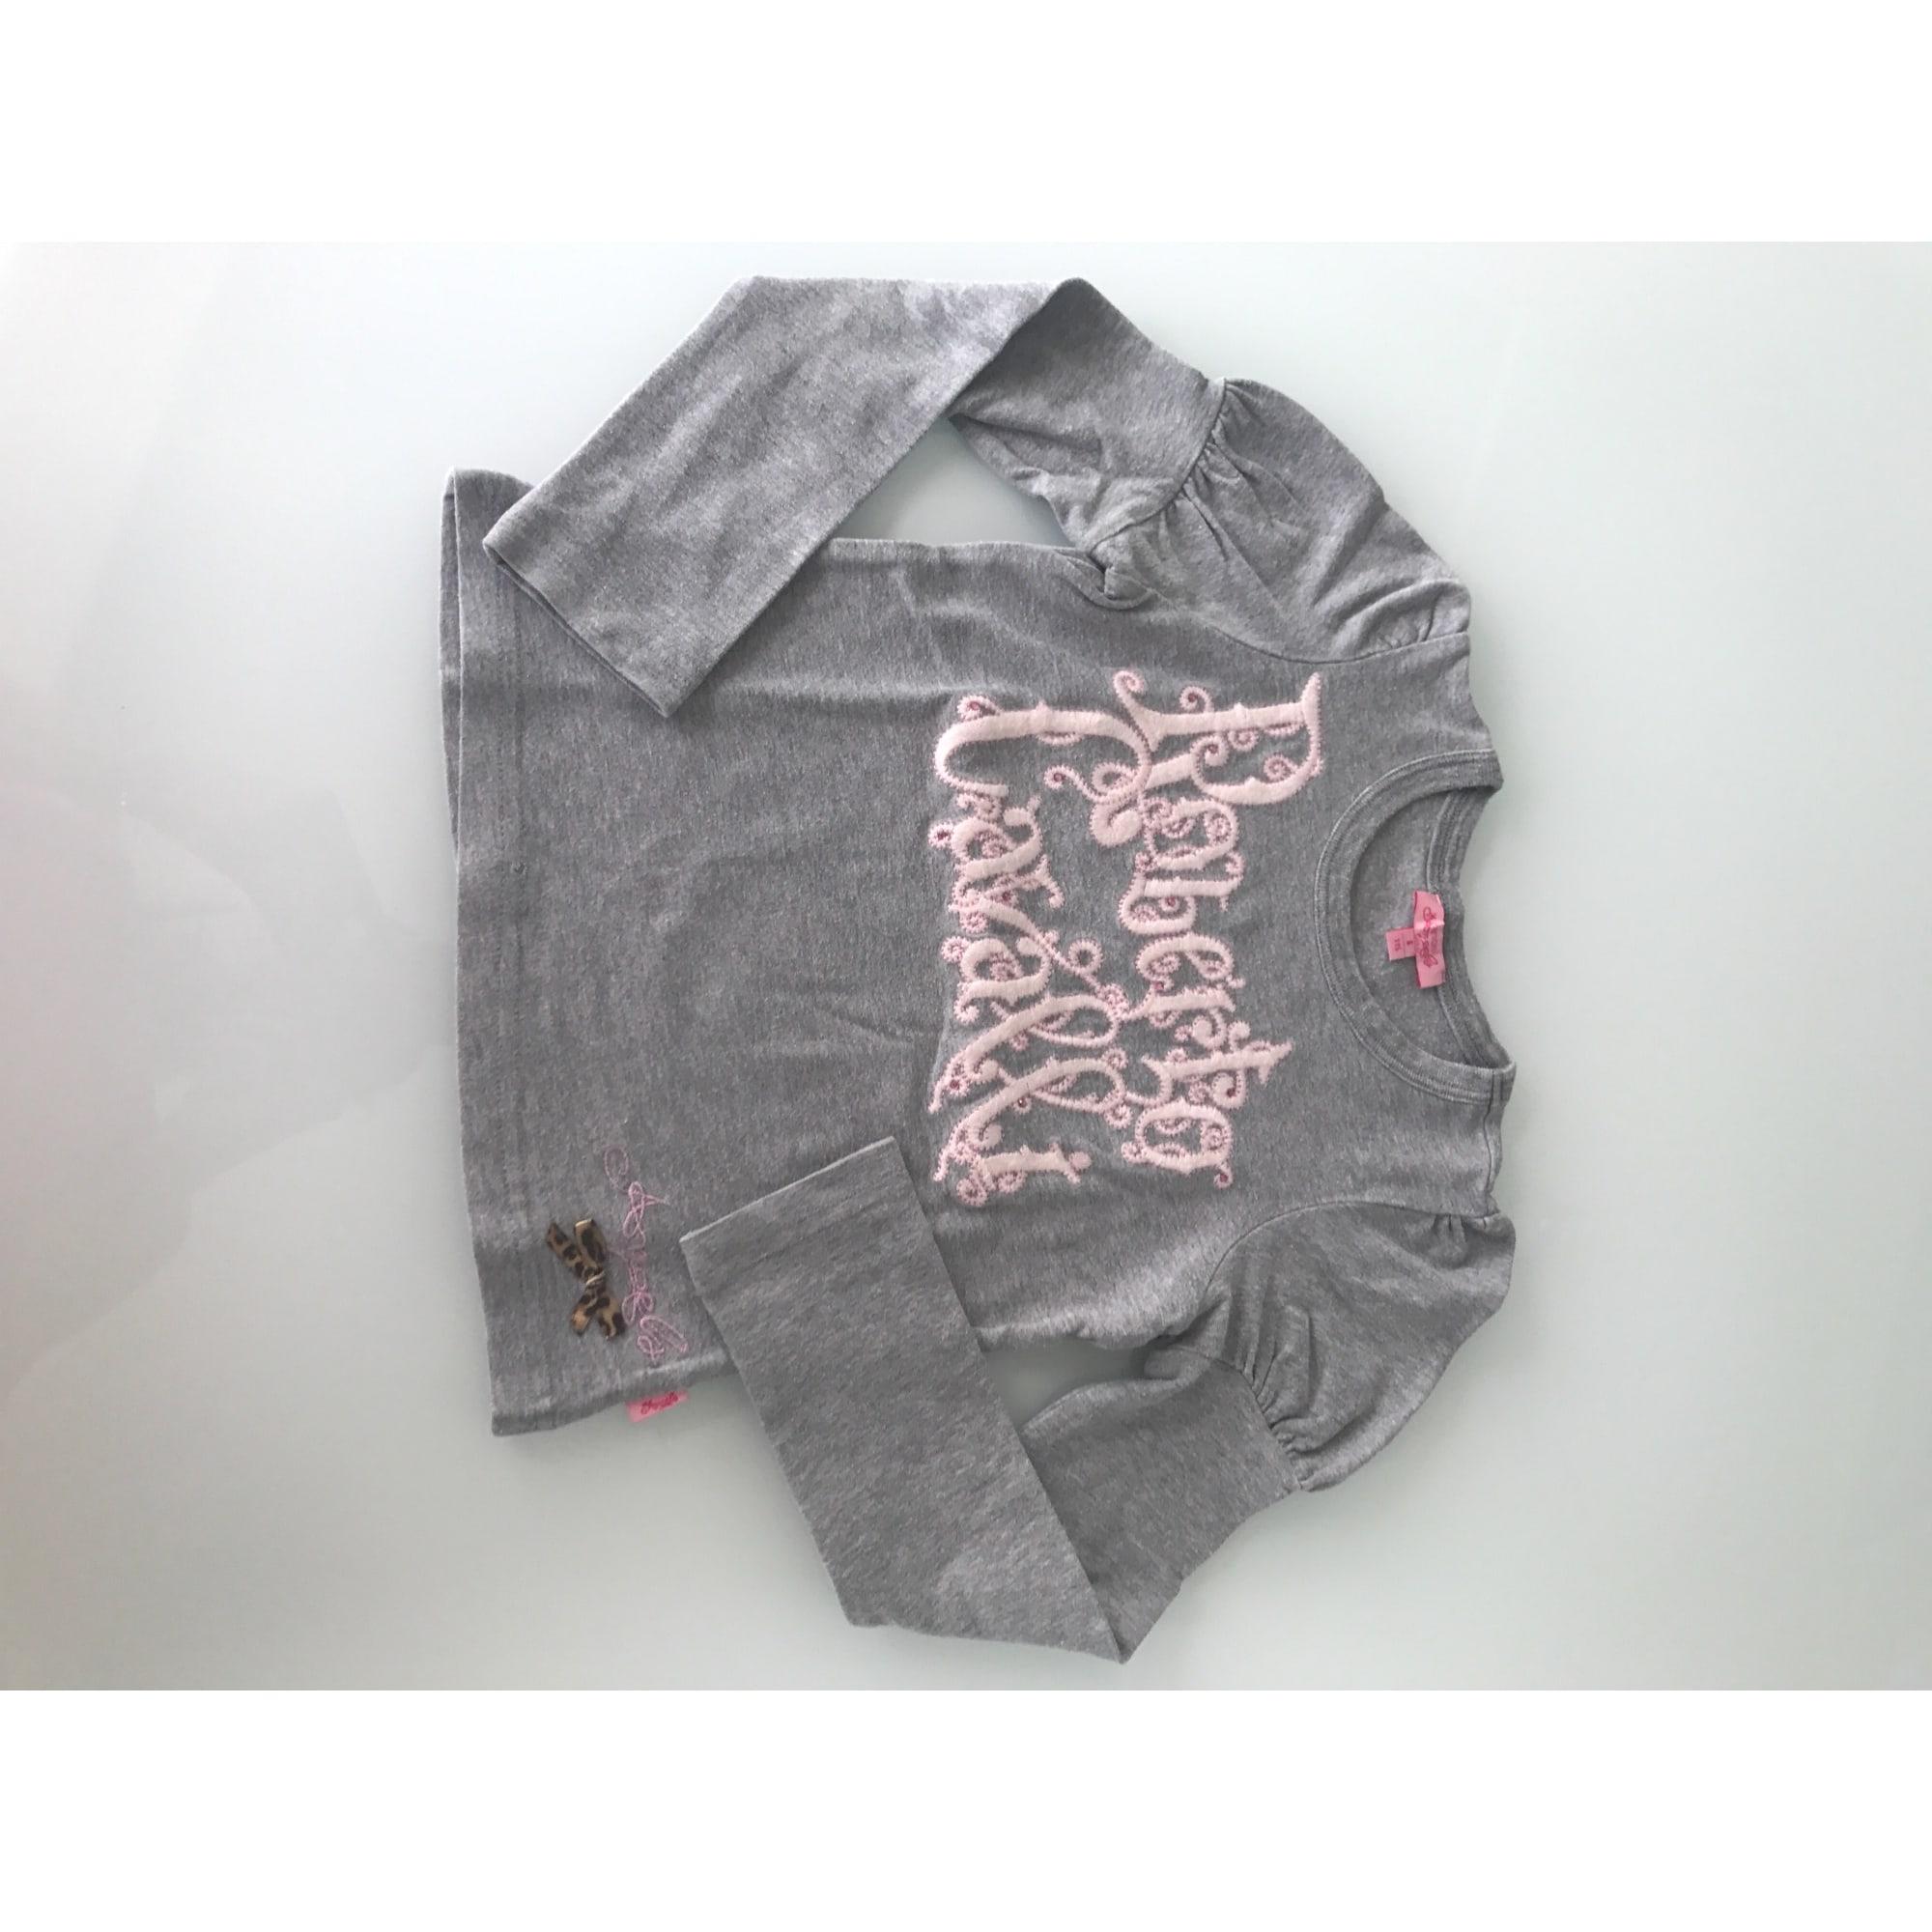 Top, Tee-shirt ROBERTO CAVALLI Gris, anthracite